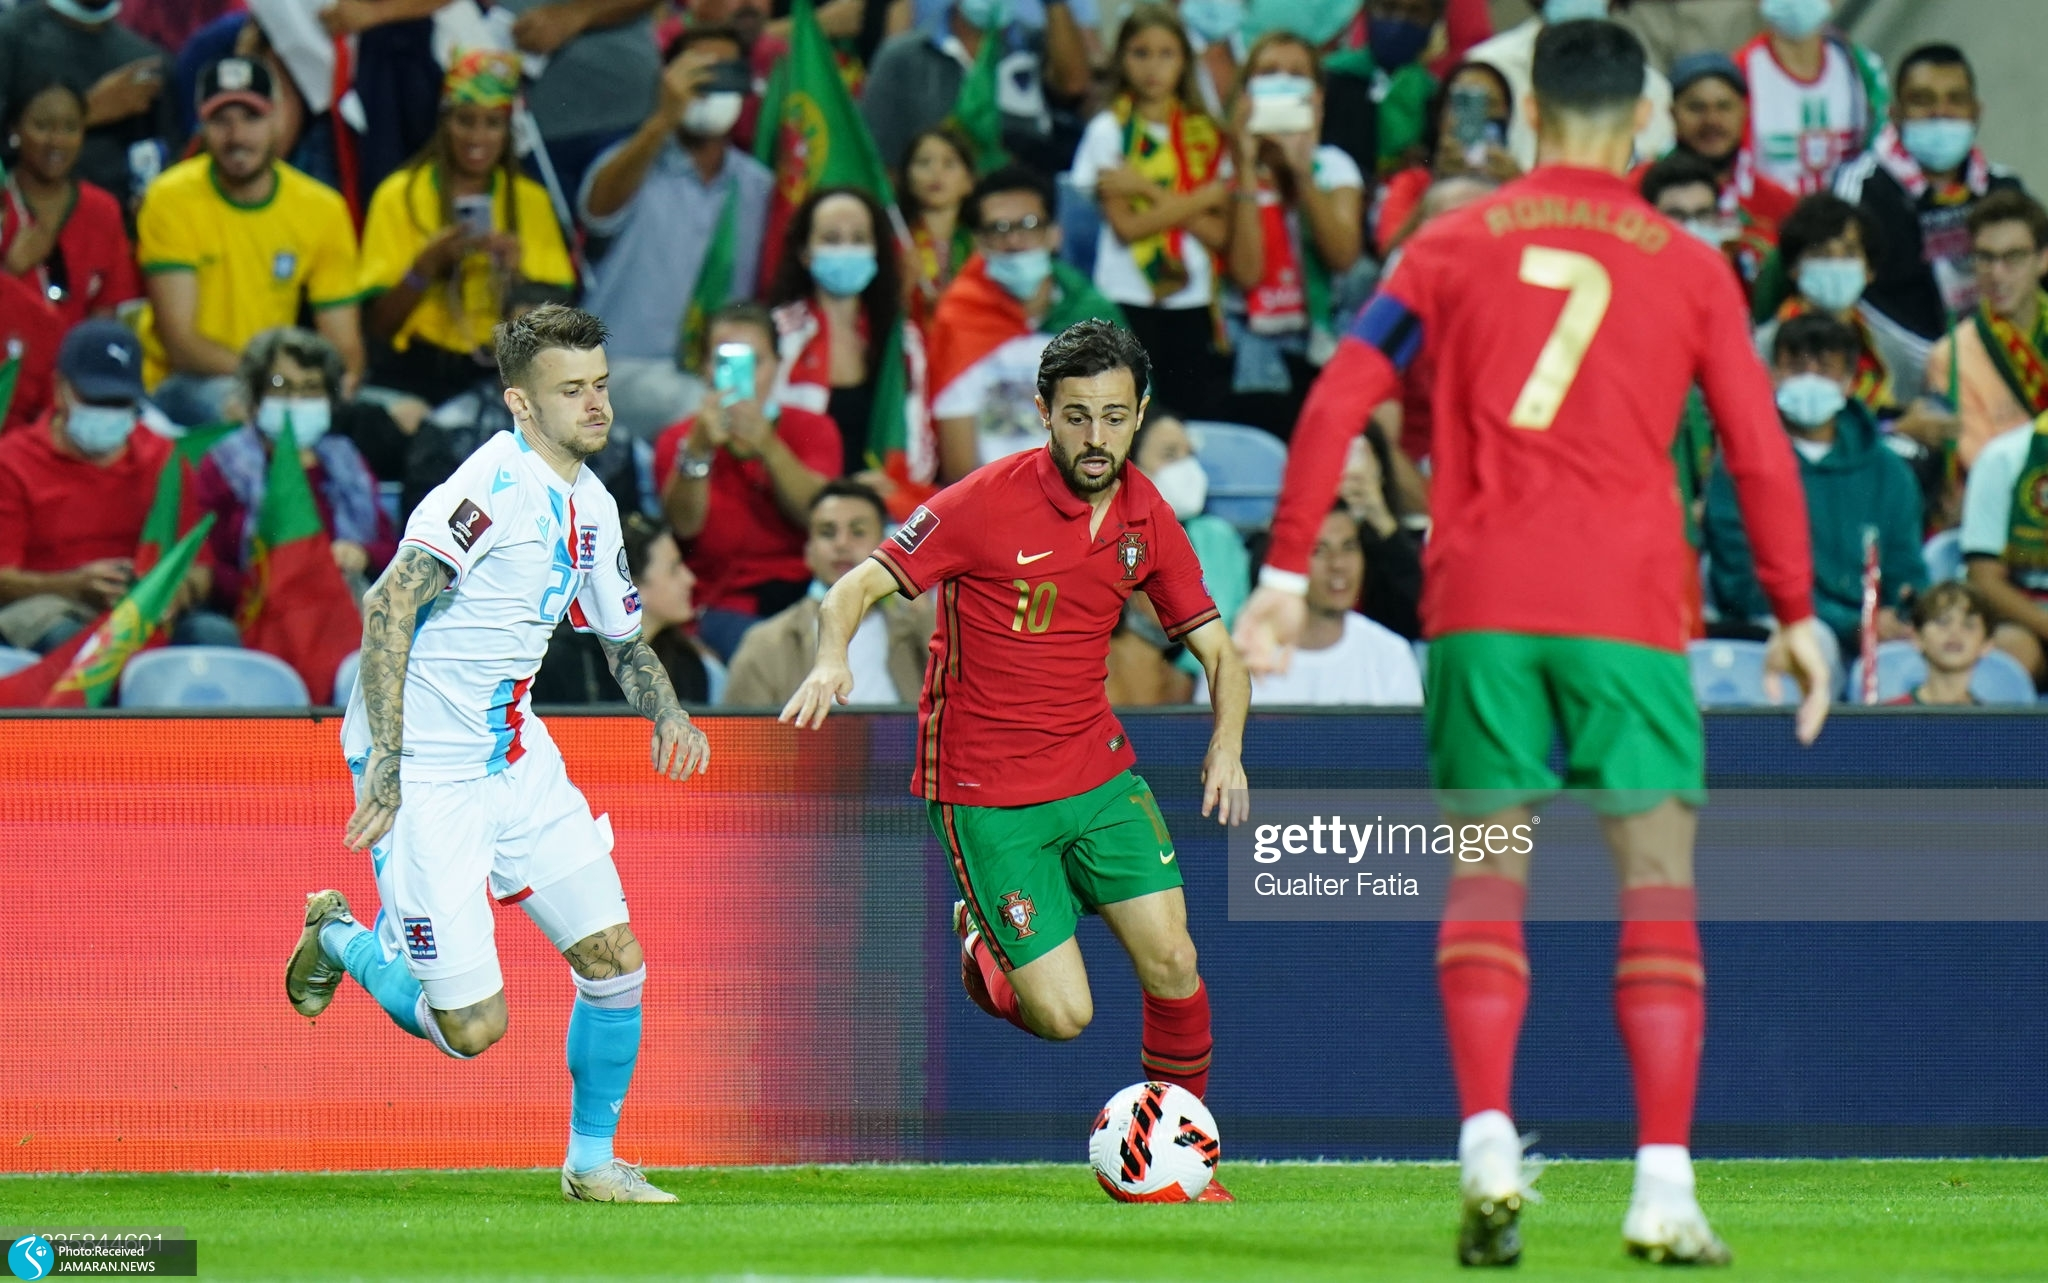 انتخابی جام جهانی - پرتغال - لوکزامبورگ